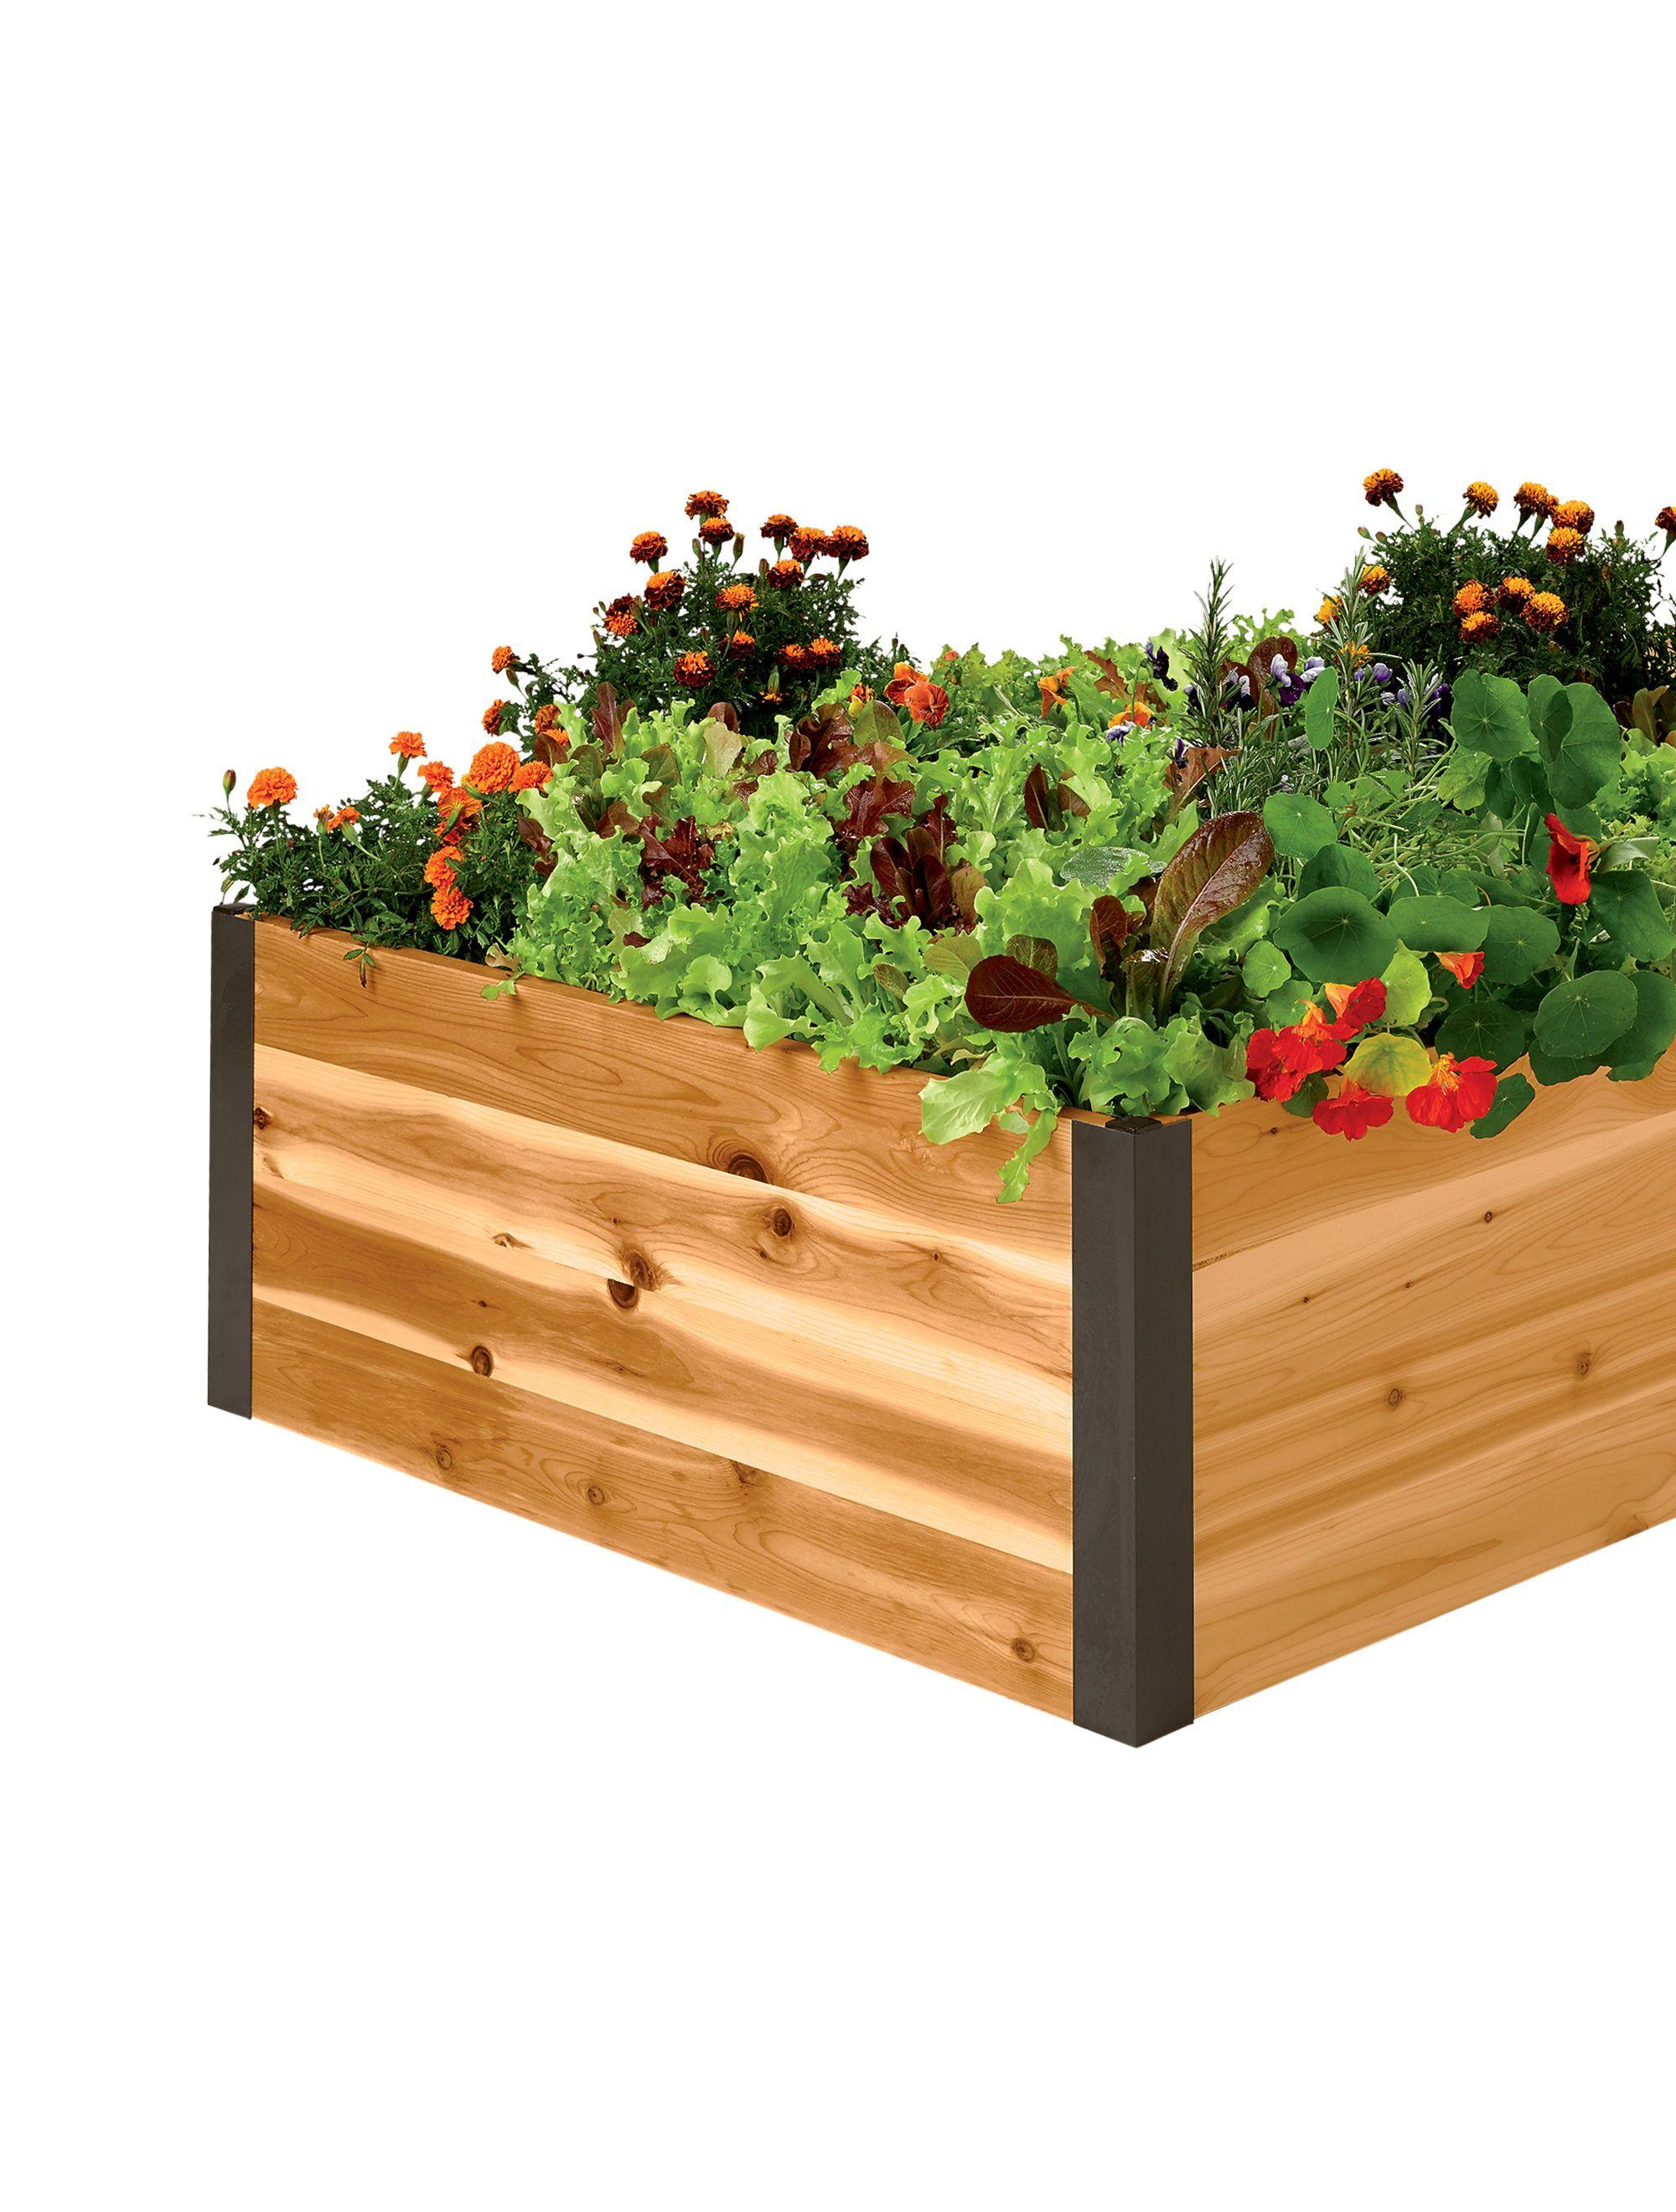 Deep Root Cedar Raised Beds 3 Ft Gardener S Supply Raised